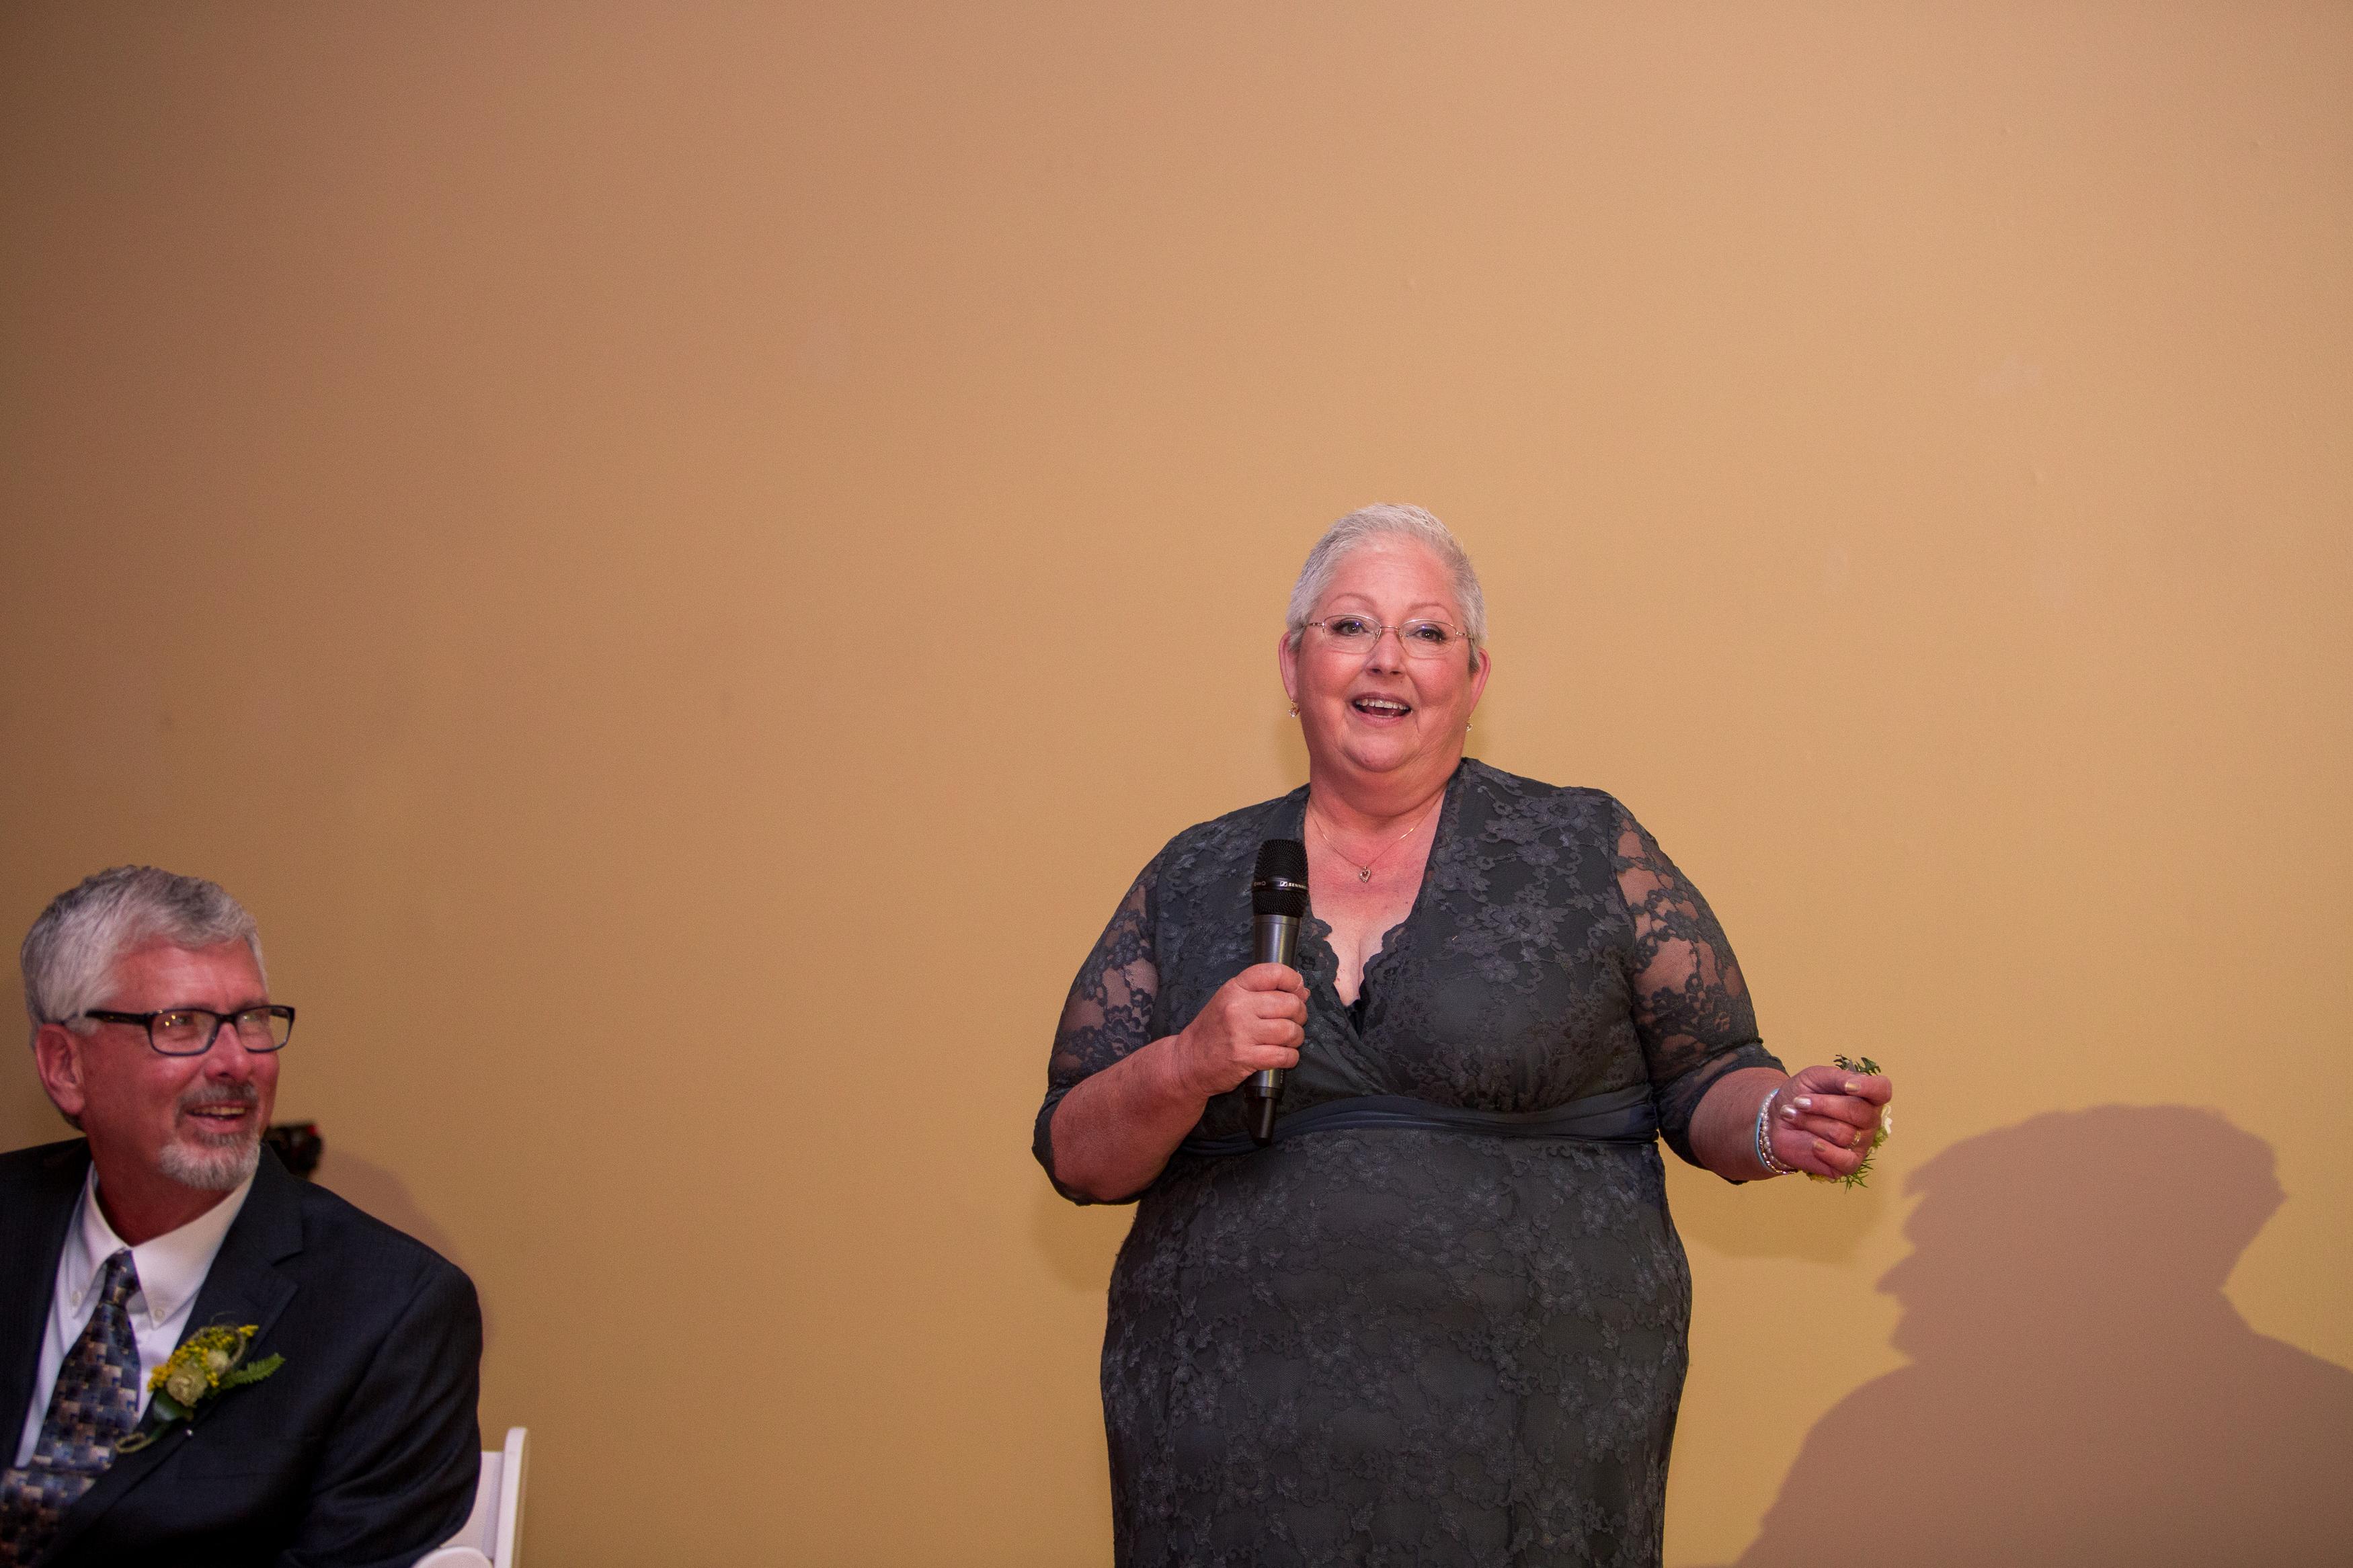 mother of bride speech at Minnetrista wedding reception in Muncie Indiana